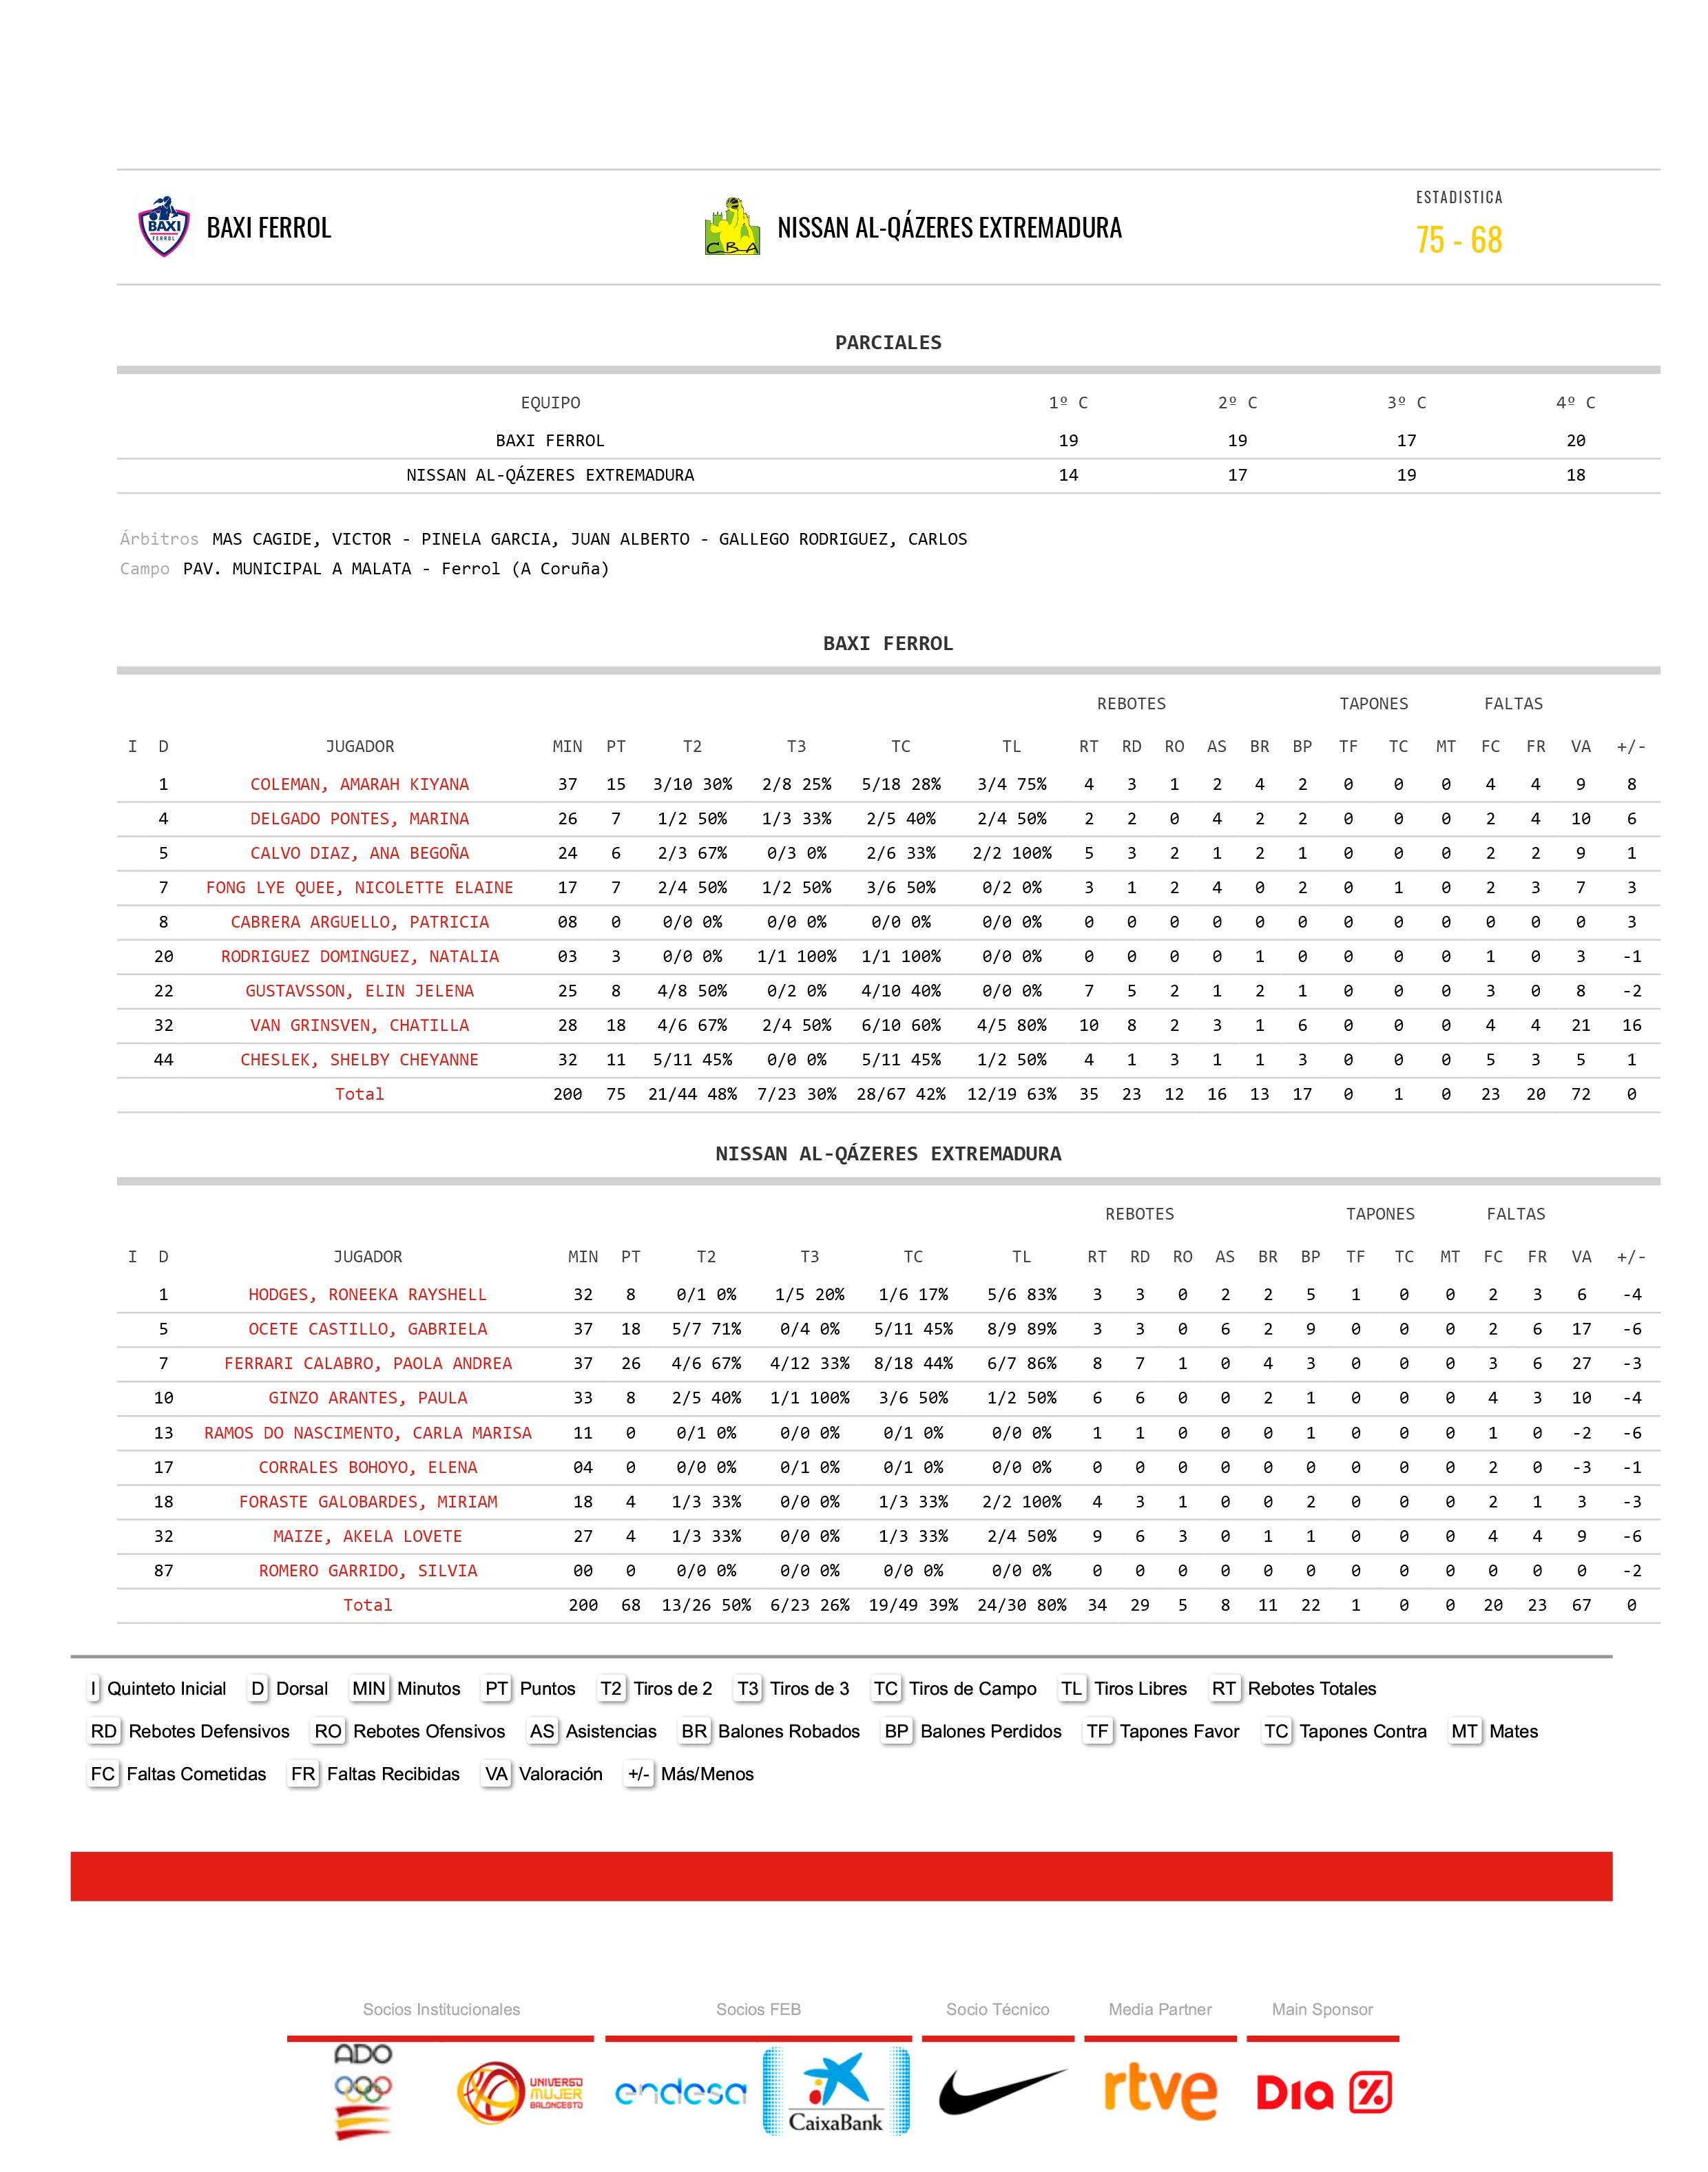 El Baxi Ferrol colista de la competición derrota al Nissan Al-Qázeres Extremadura